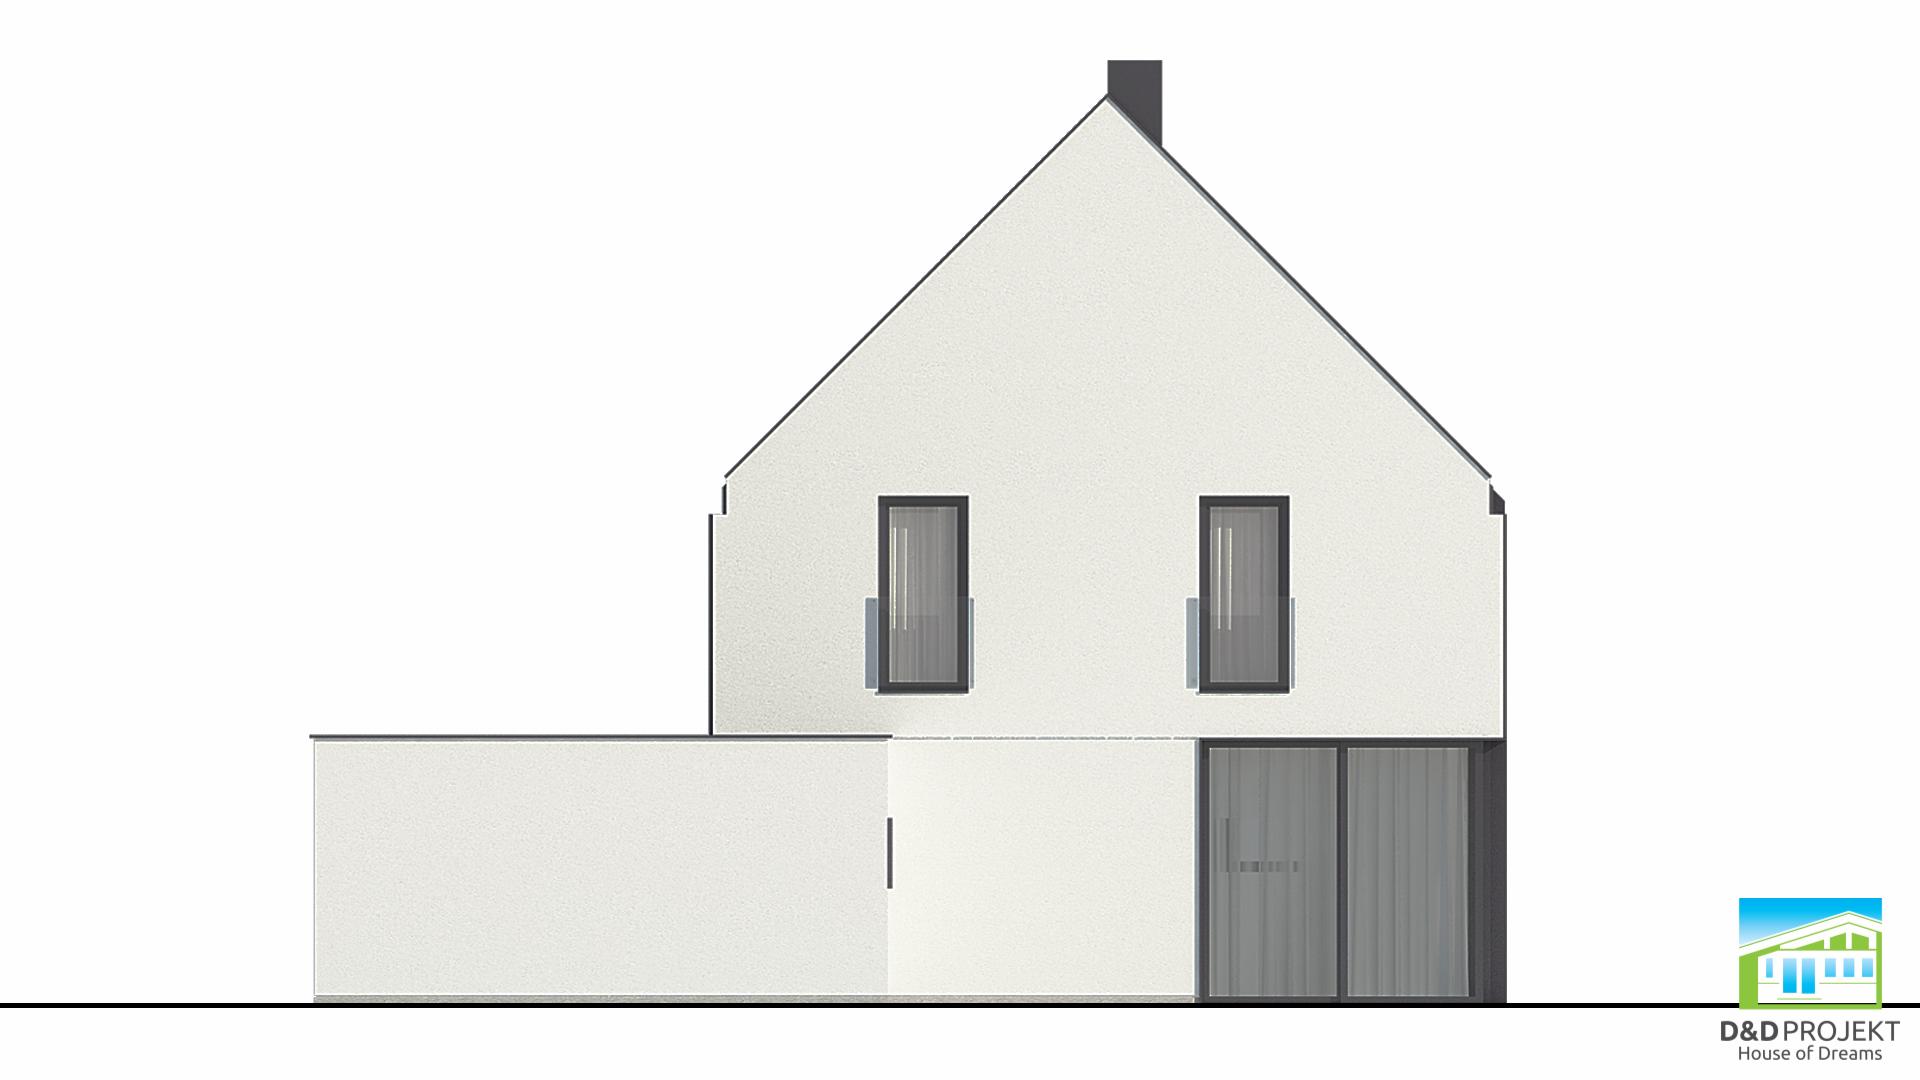 https://ddprojekt.pl/wp-content/uploads/2020/03/elewacja2-4.jpg